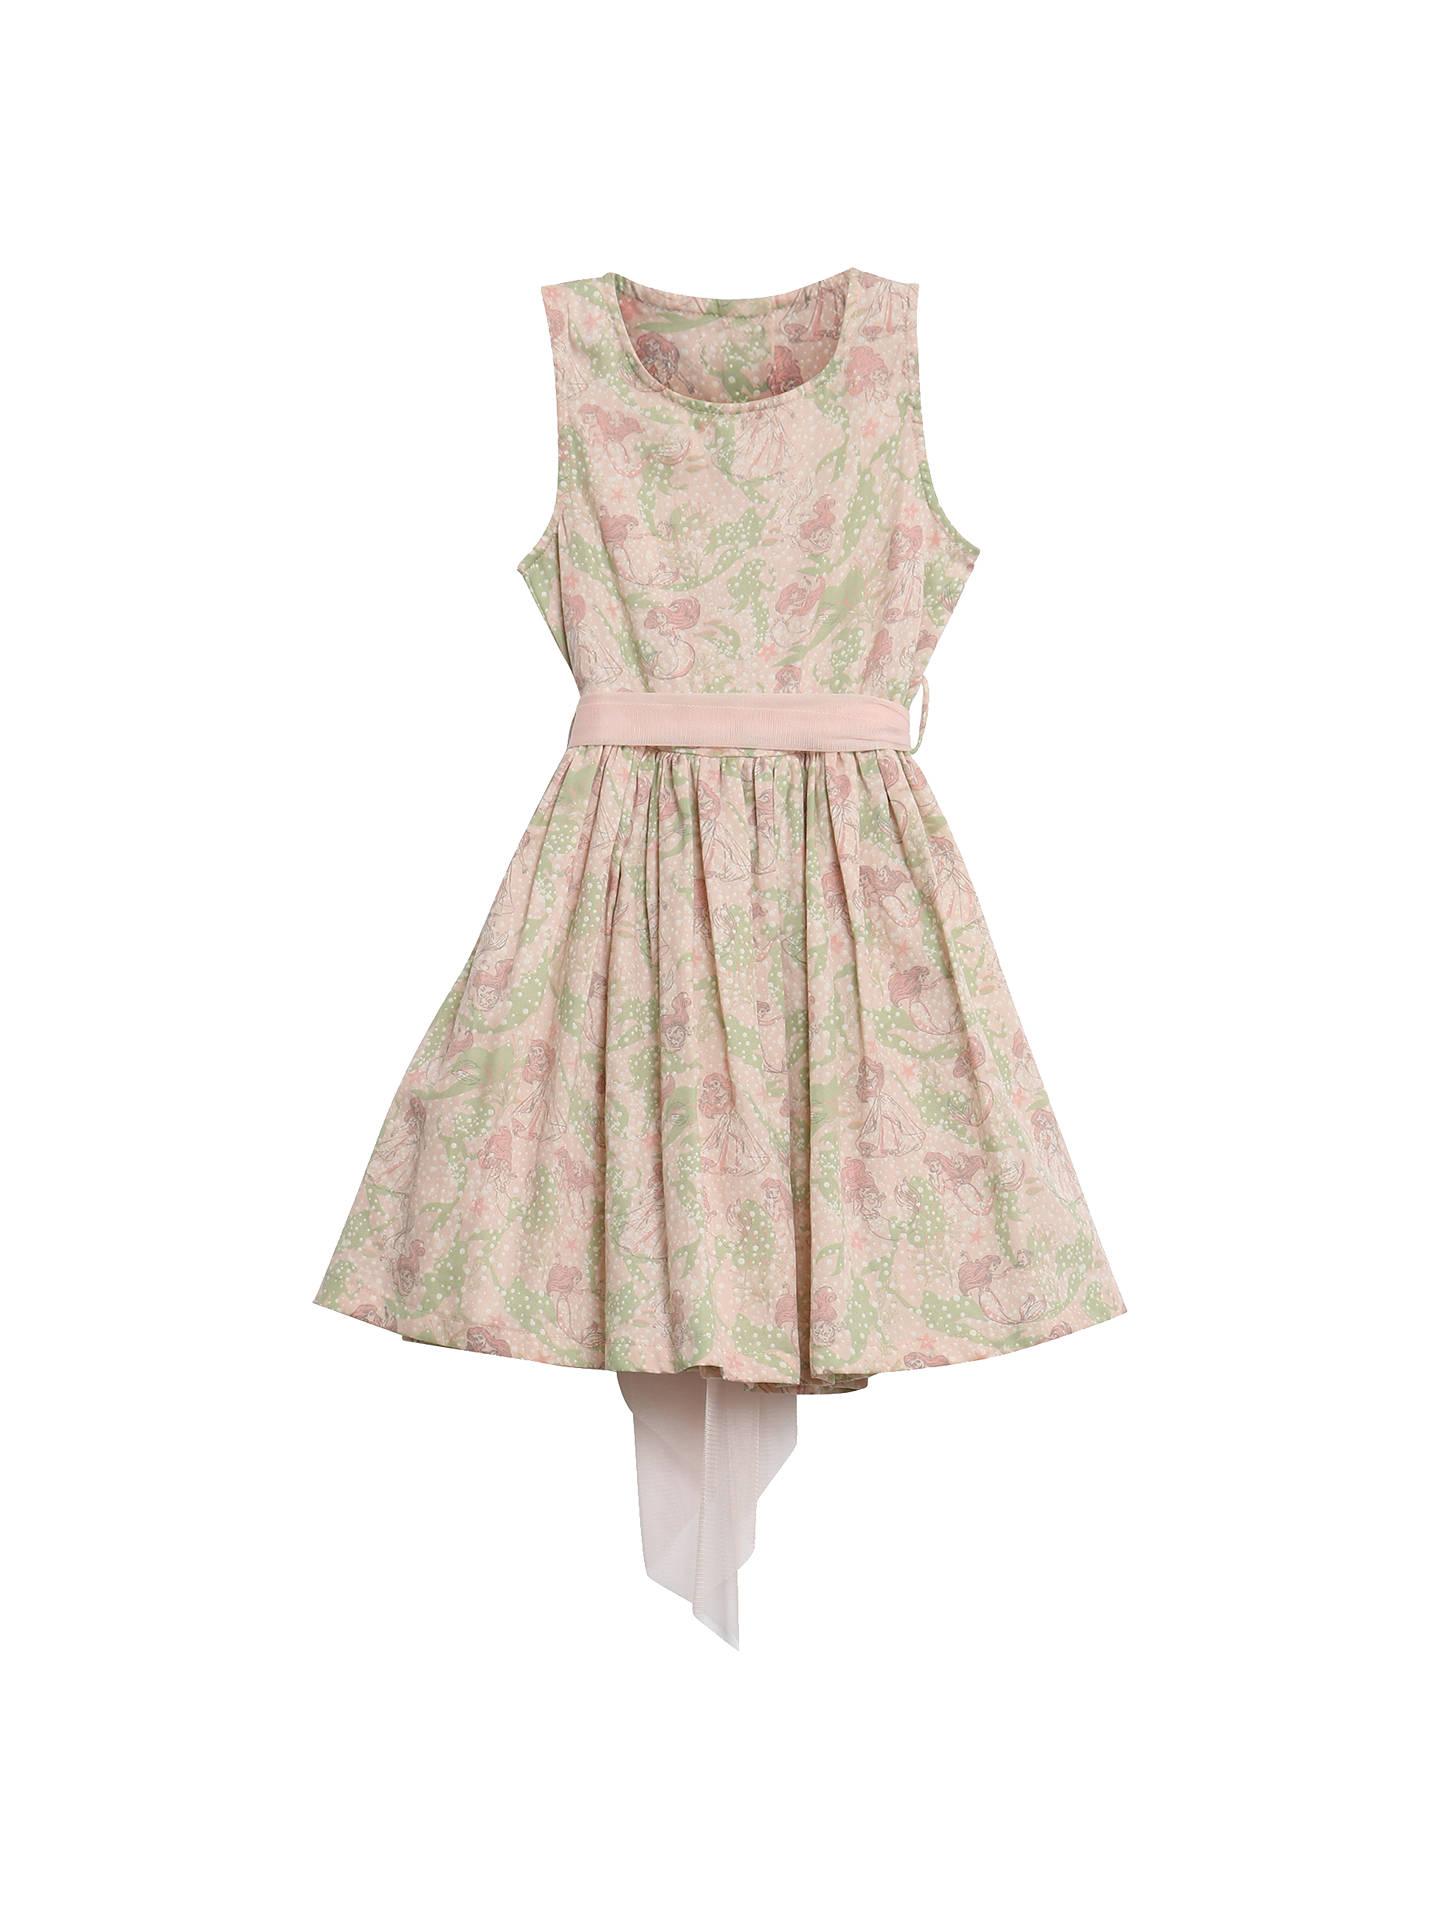 cca12d0a9e34 BuyWheat Disney Girls  Princess Ariel Dress